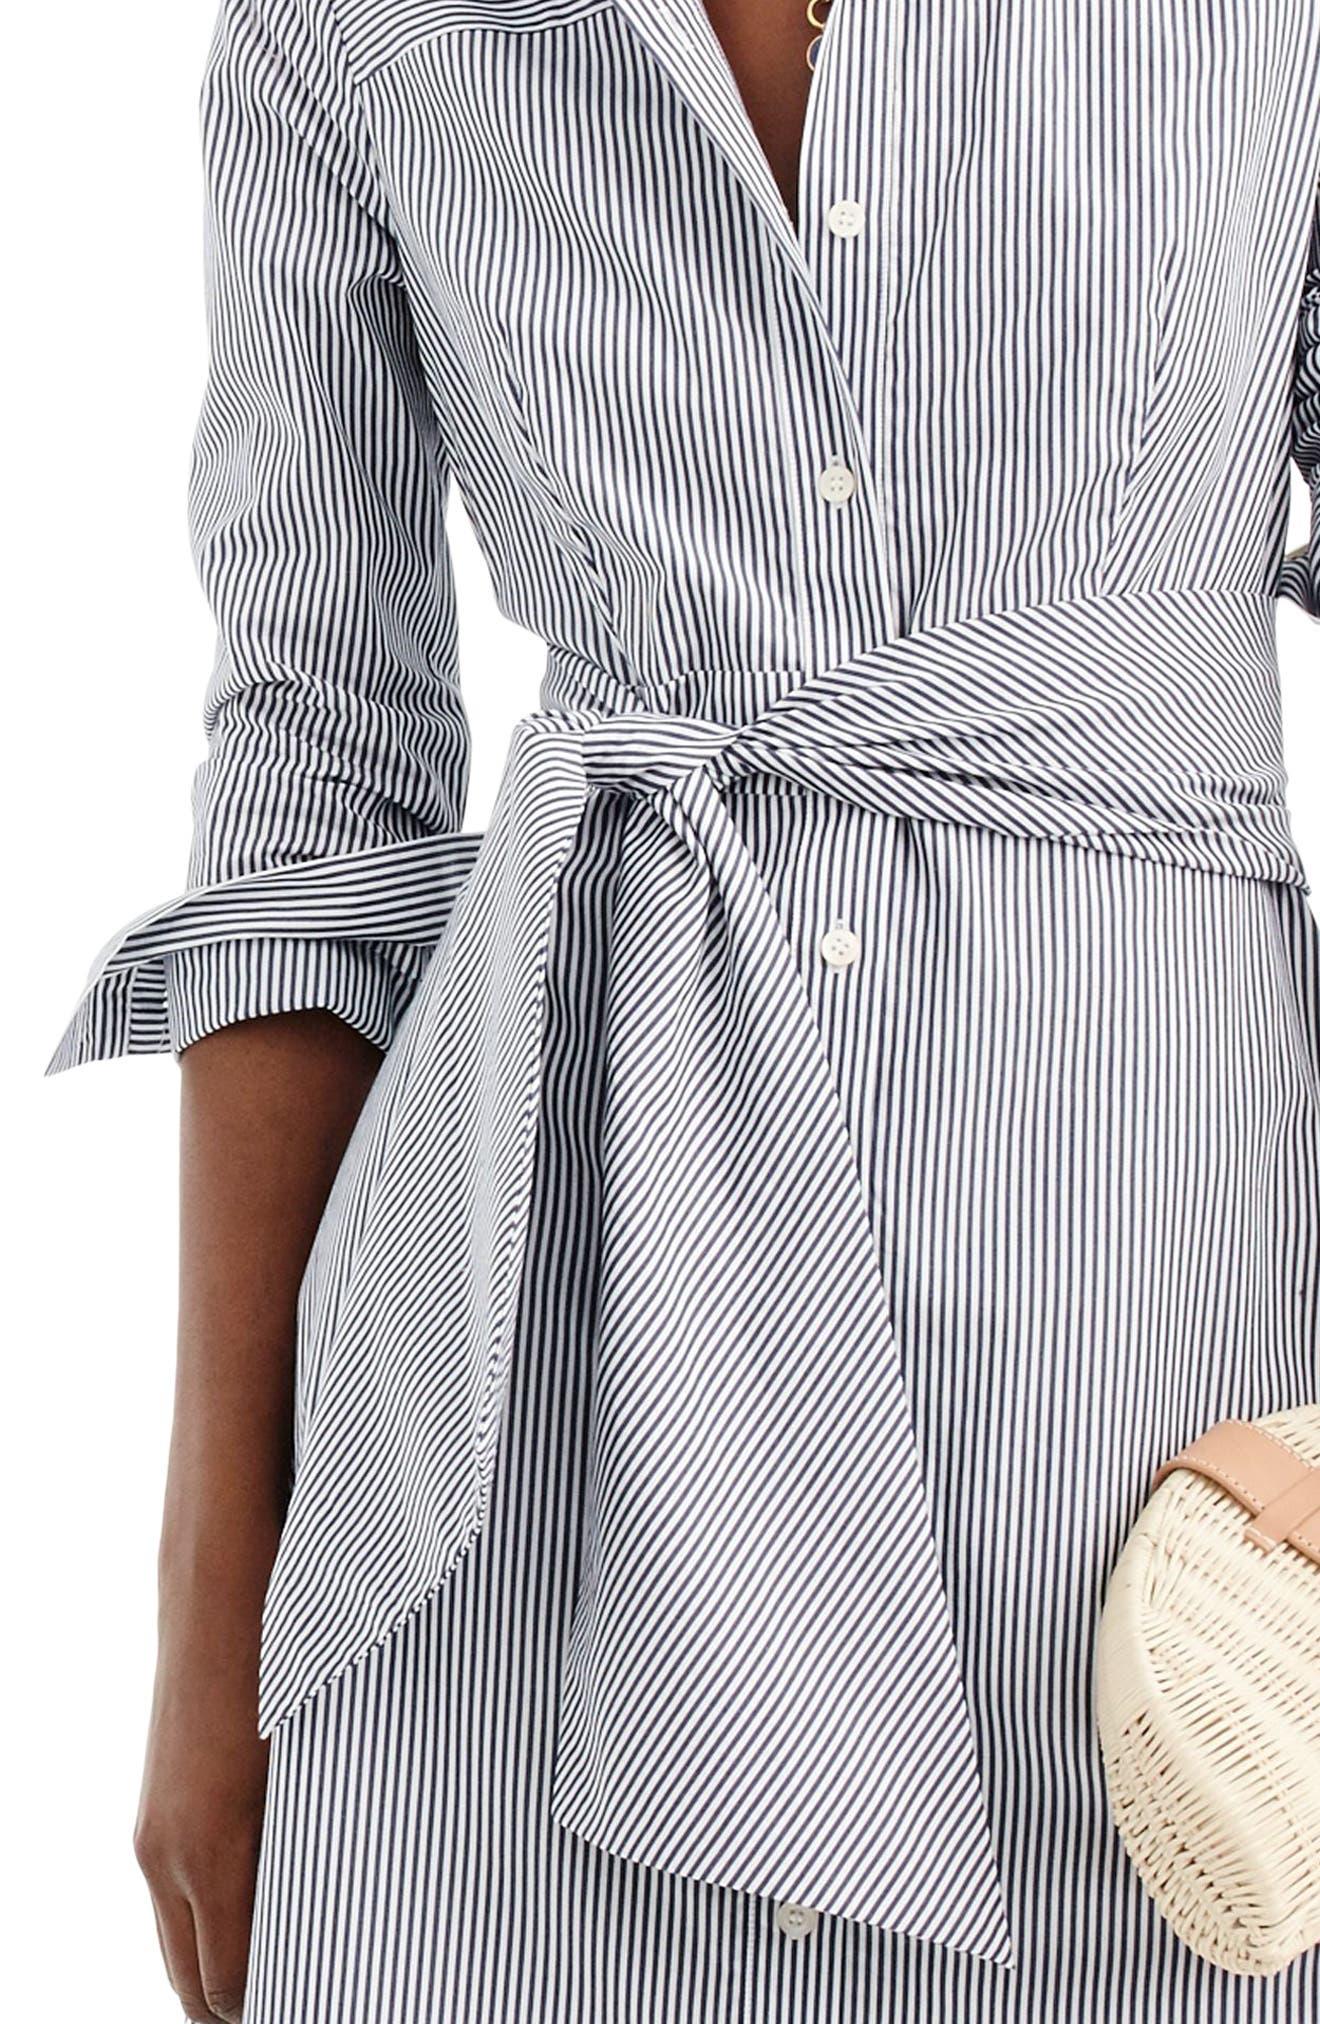 J.CREW, Stripe Tie-Waist Shirtdress, Alternate thumbnail 2, color, WHITE NAVY